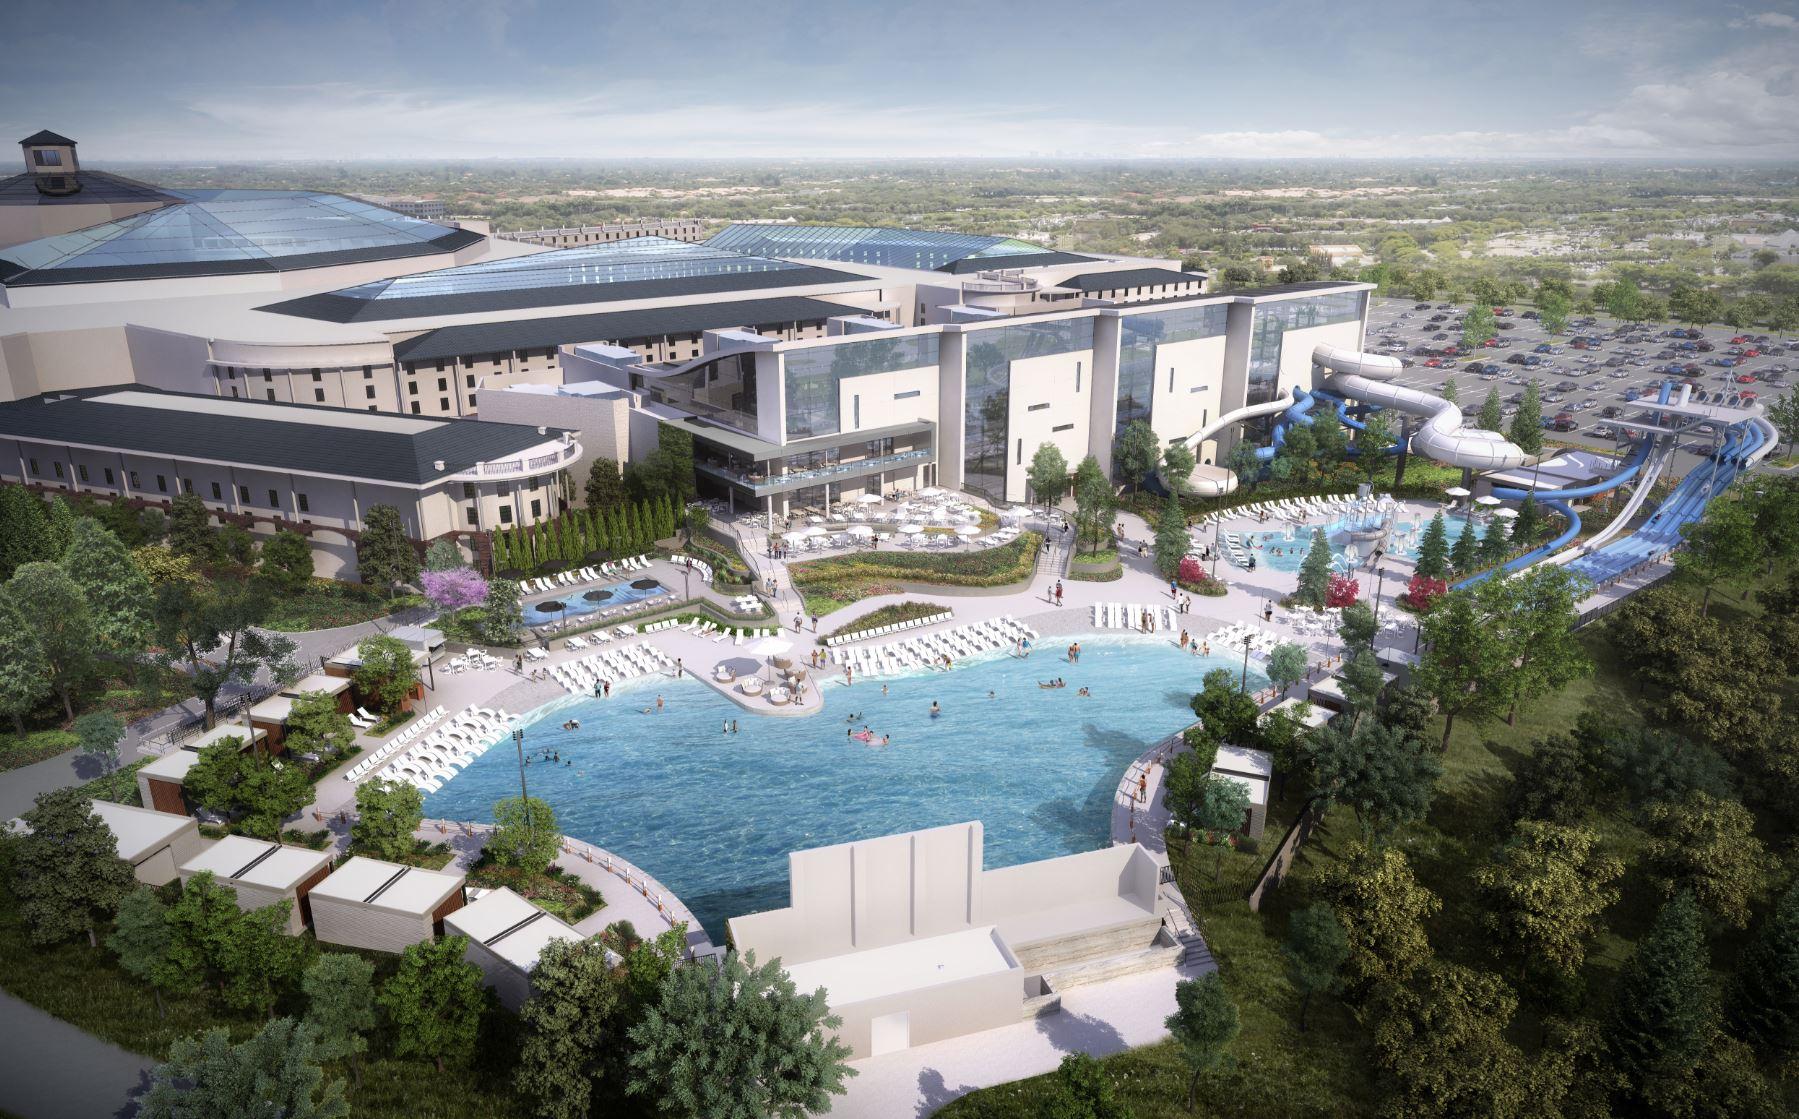 11alive.com | Opryland resort to build $90M water park